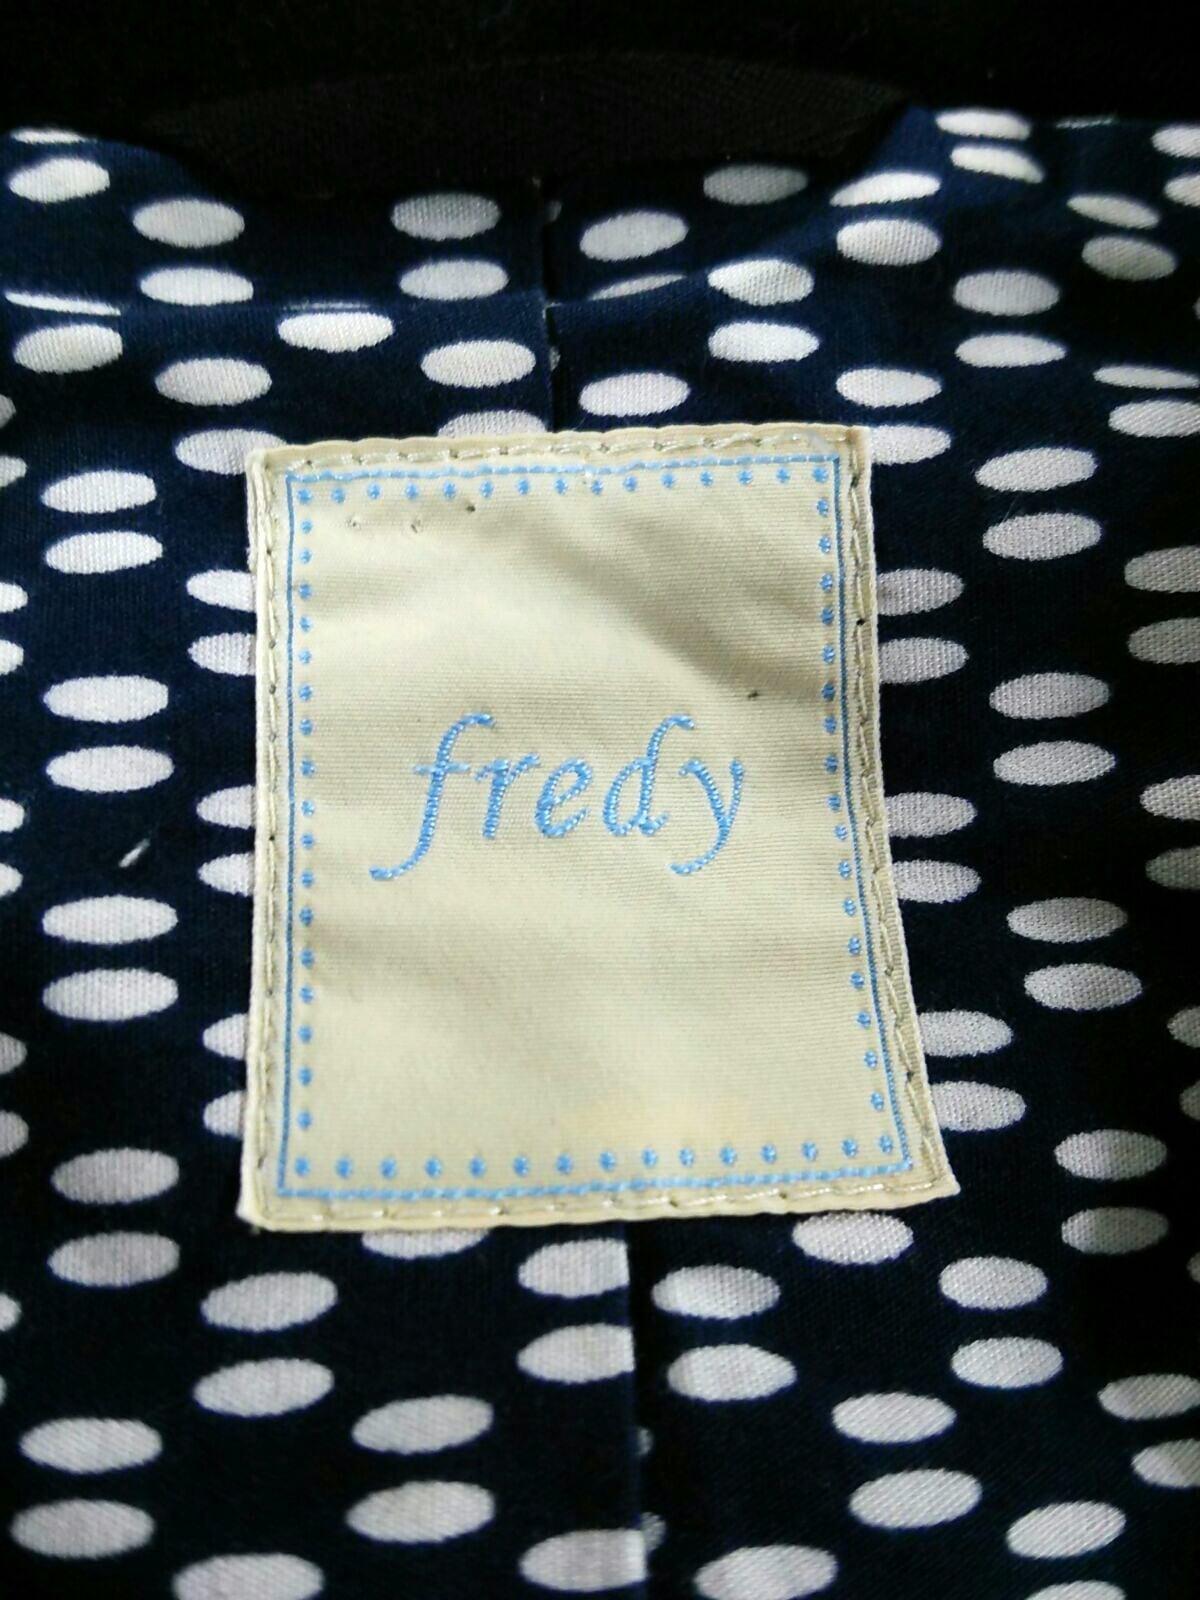 Fredy(フレディ)のジャケット